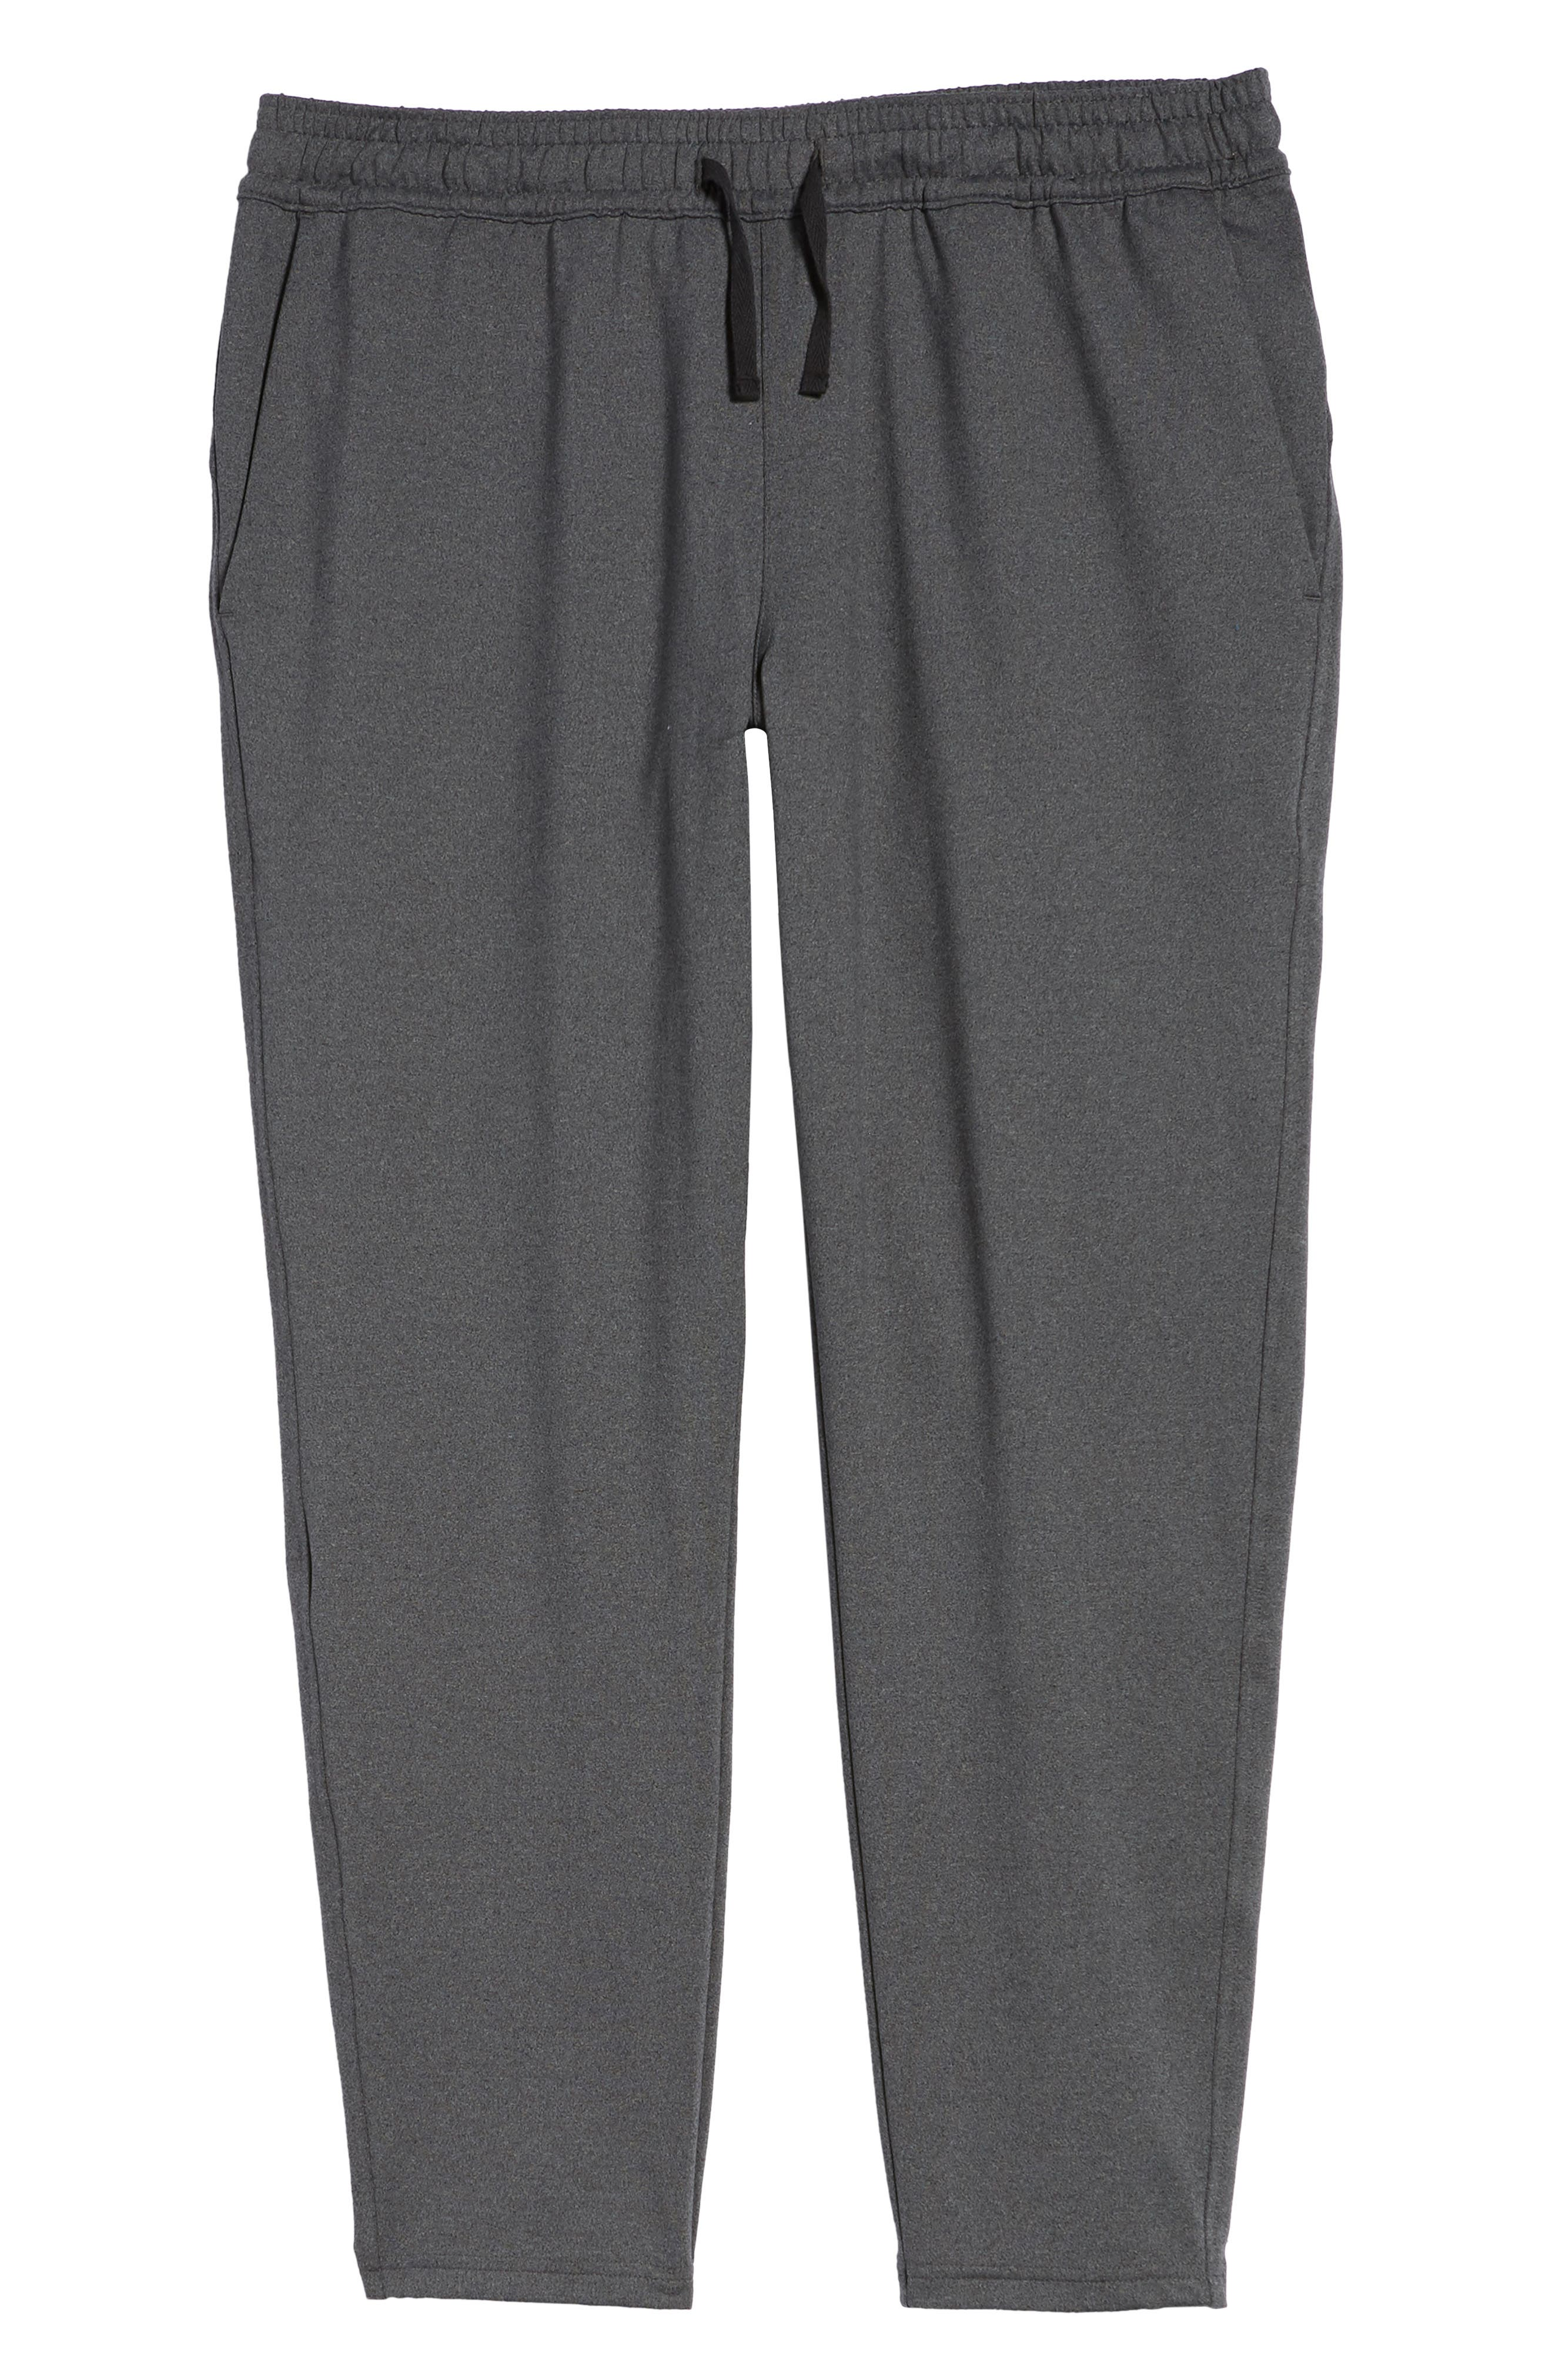 Active Crop Jogger Pants,                             Alternate thumbnail 5, color,                             Grey Obsidian Melange